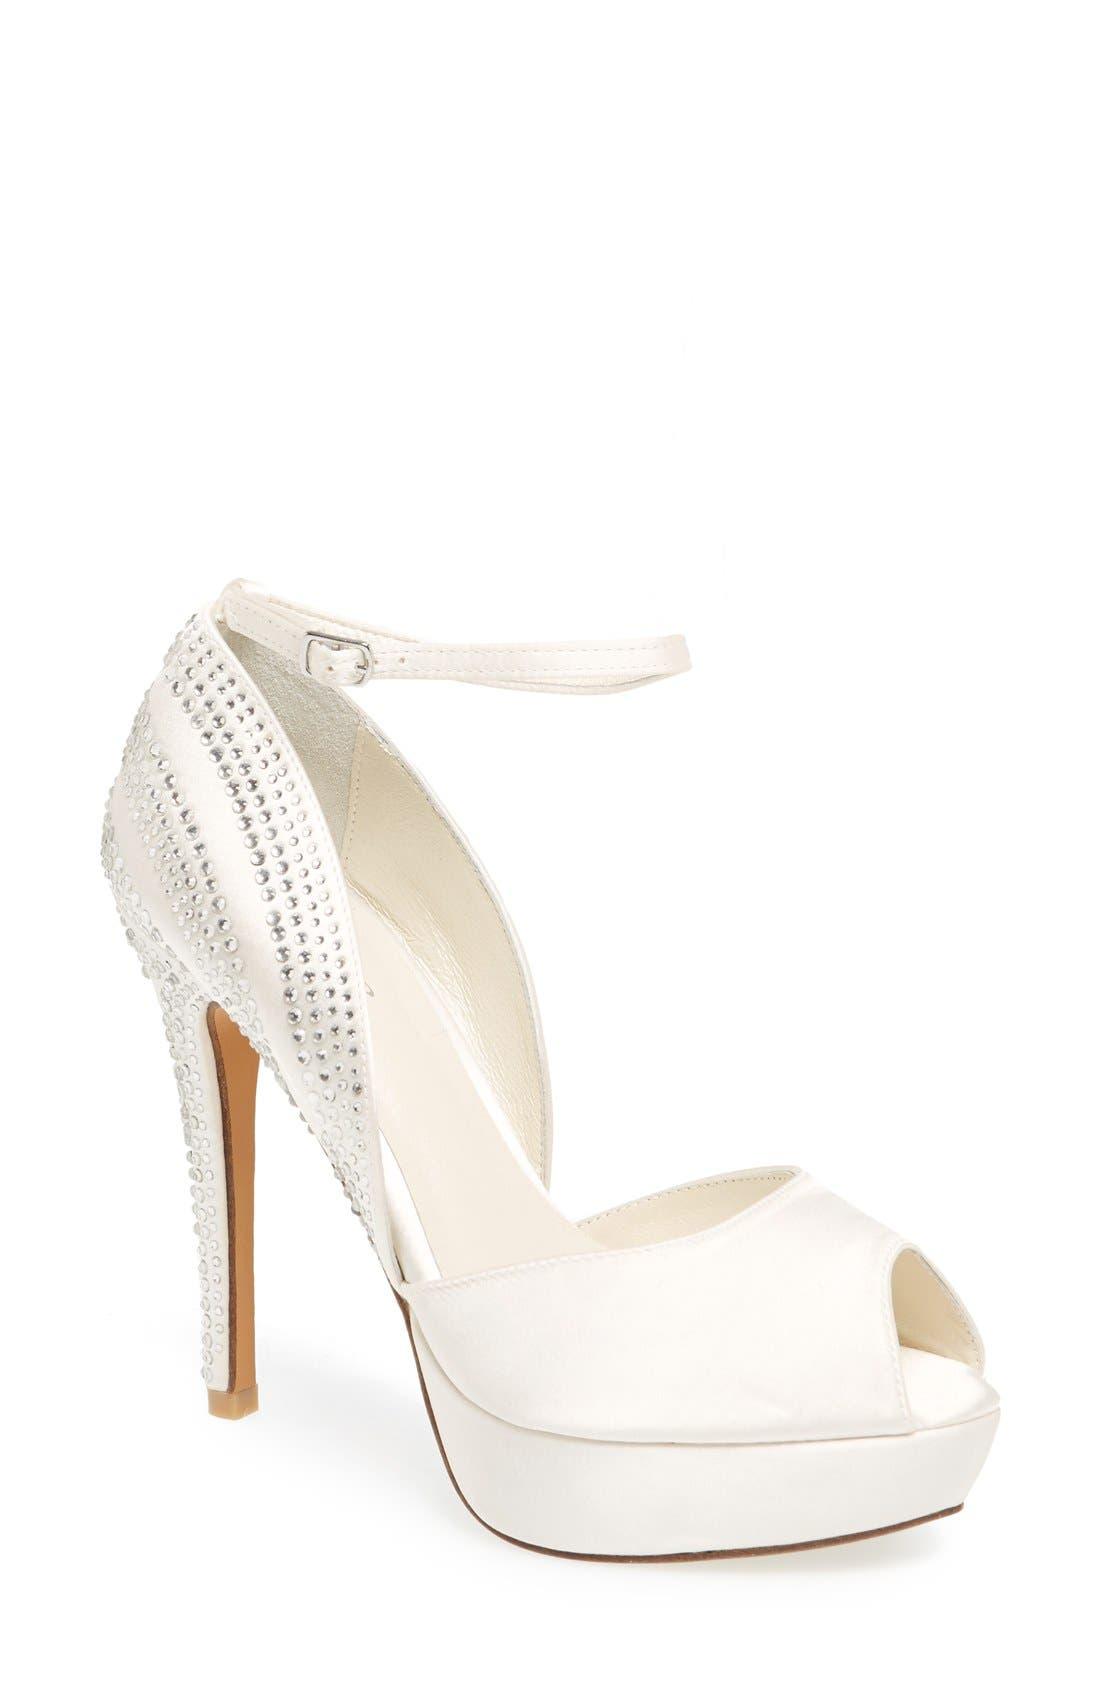 Alternate Image 1 Selected - Menbur 'Paloma' d'Orsay Platform Sandal (Women)